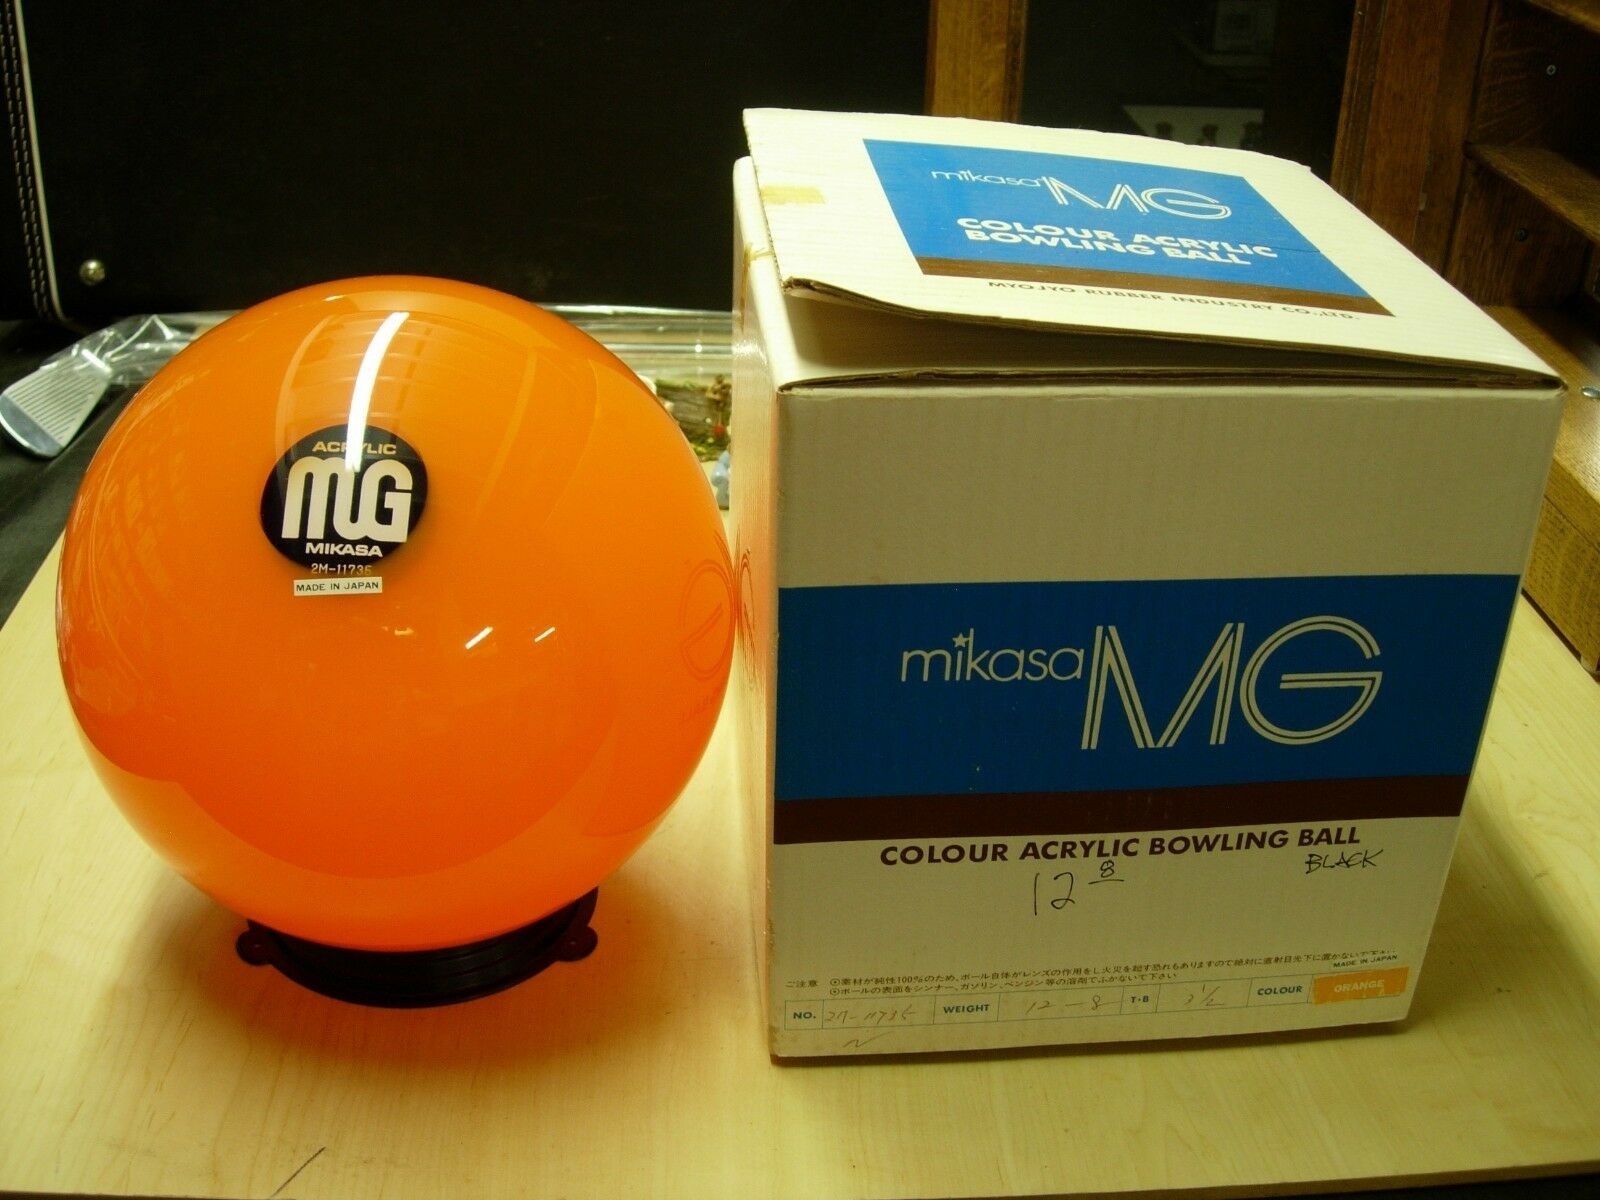 =12oz TW 3.5 2M-11735 Mikasa MG Colour Acrylic orange Bowling Ball Blk Center